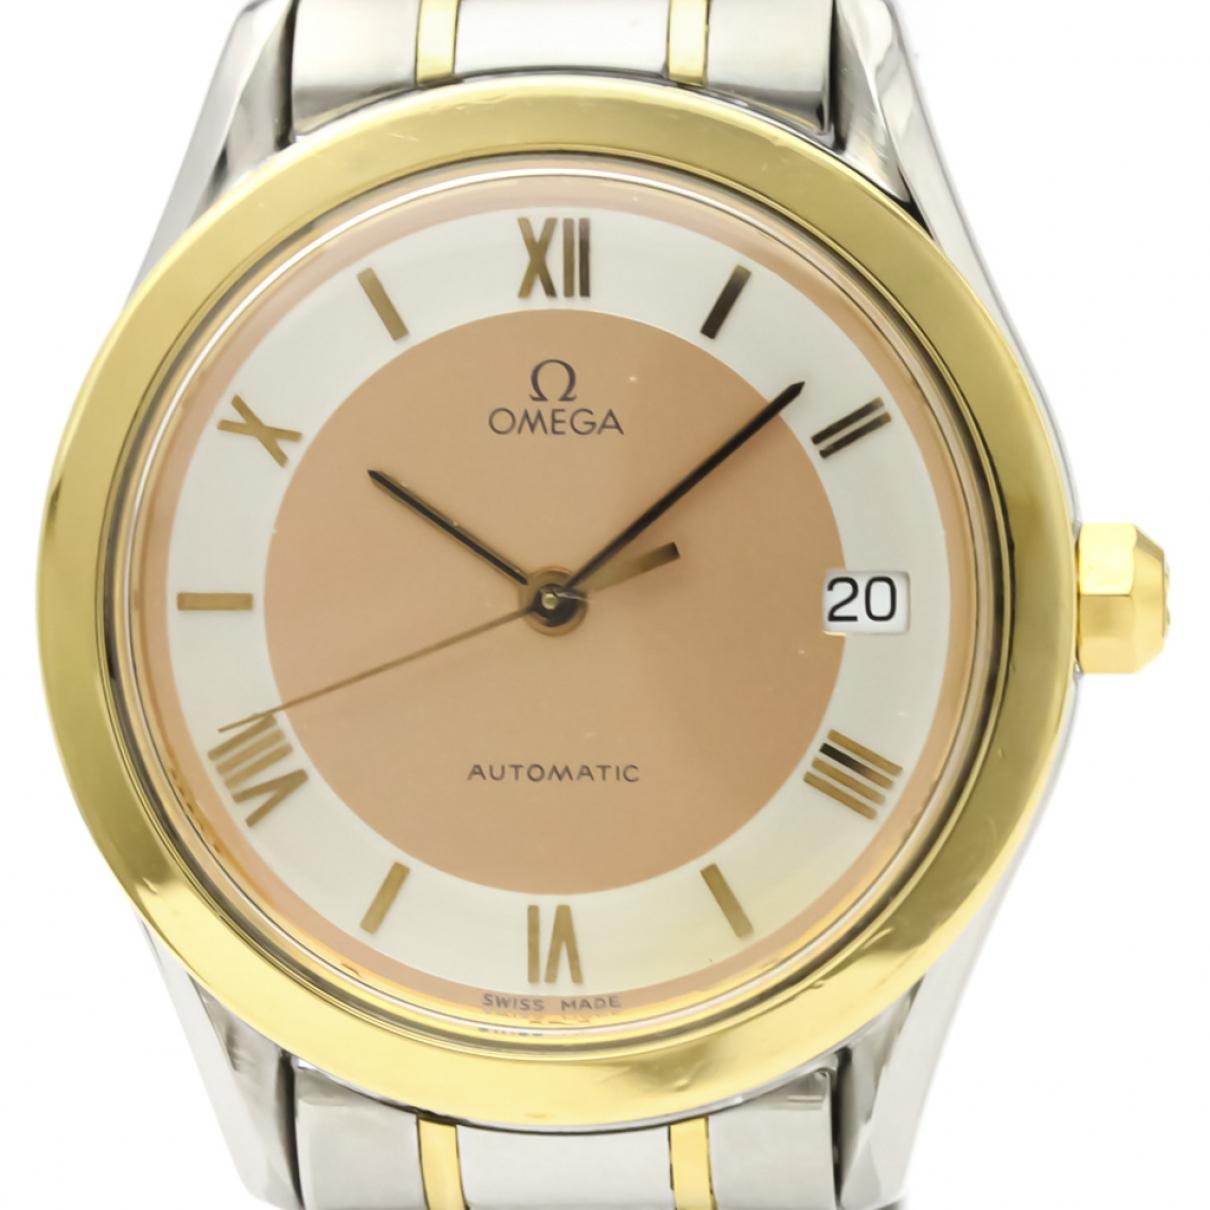 Omega \N Orange gold and steel watch for Women \N